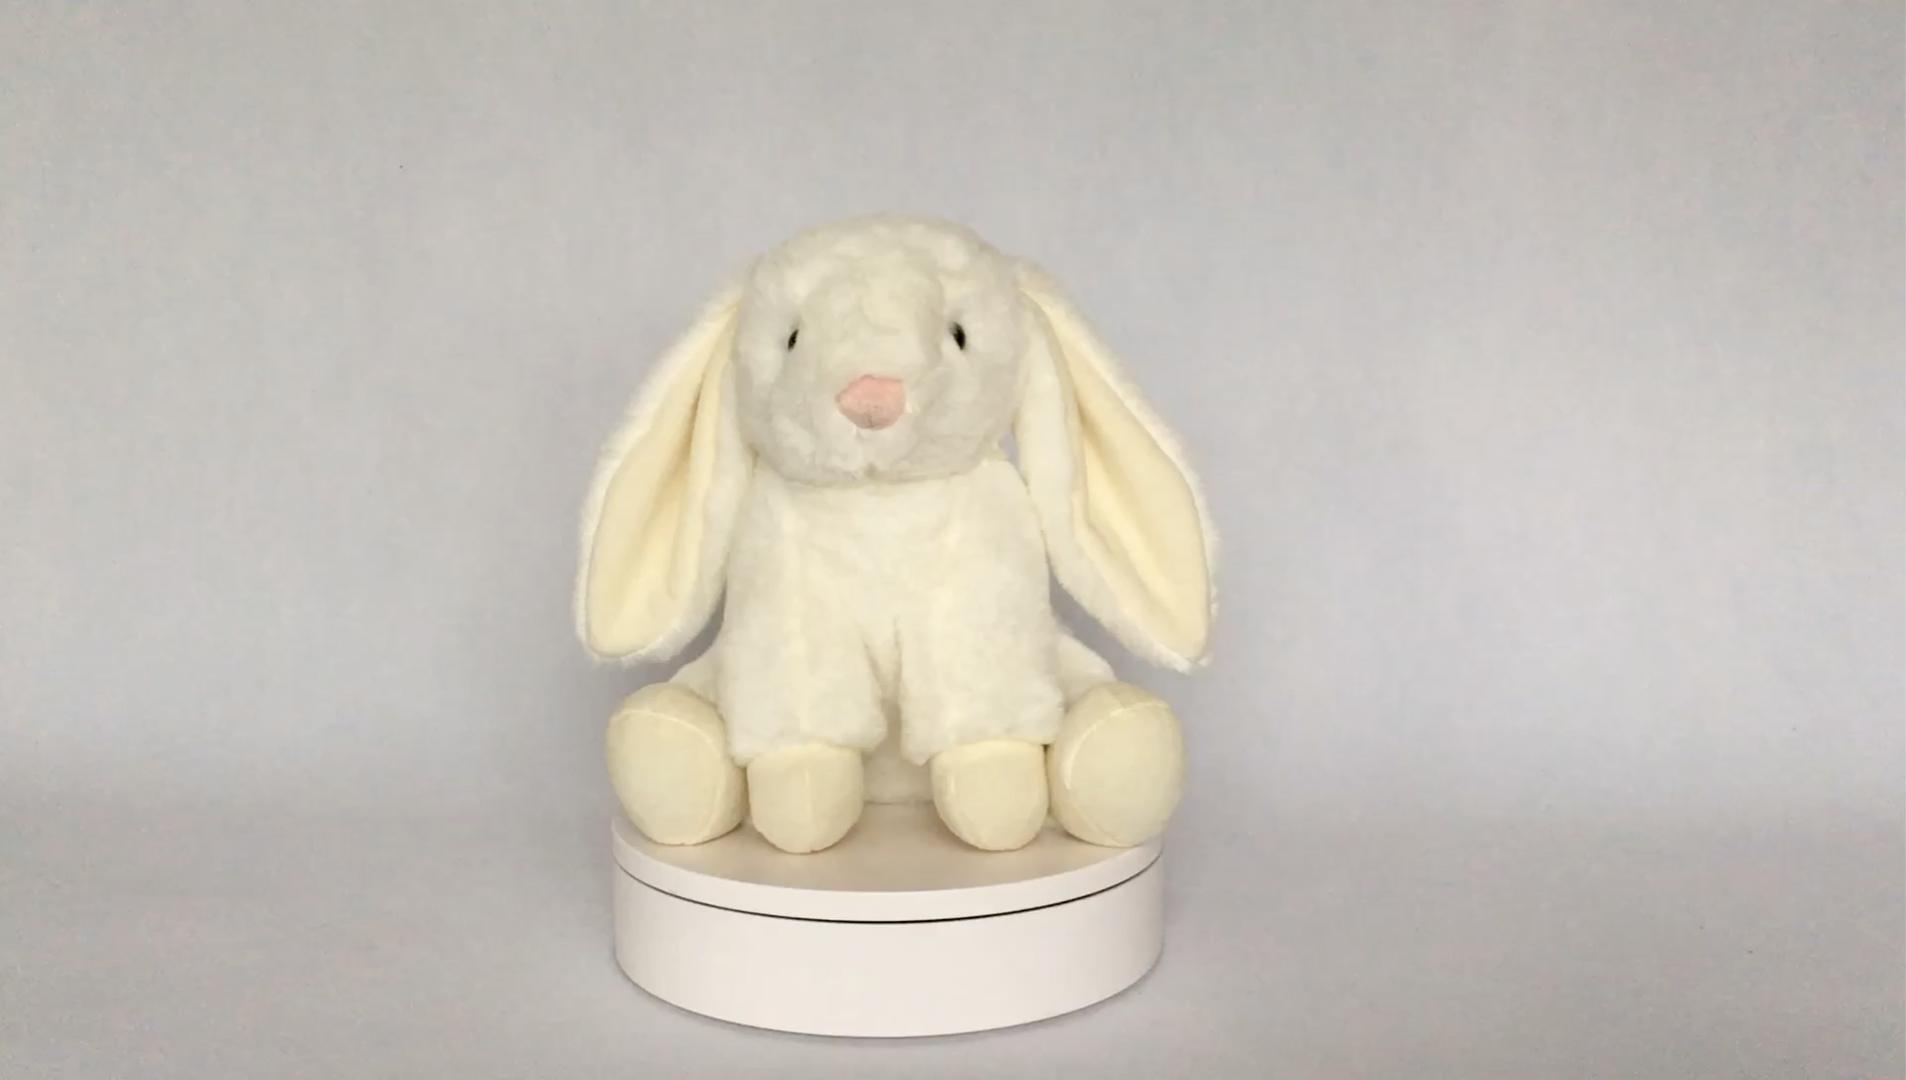 Plush easter bunnies หูยาวตุ๊กตาตุ๊กตากระต่ายตุ๊กตากระต่ายตุ๊กตาสัตว์